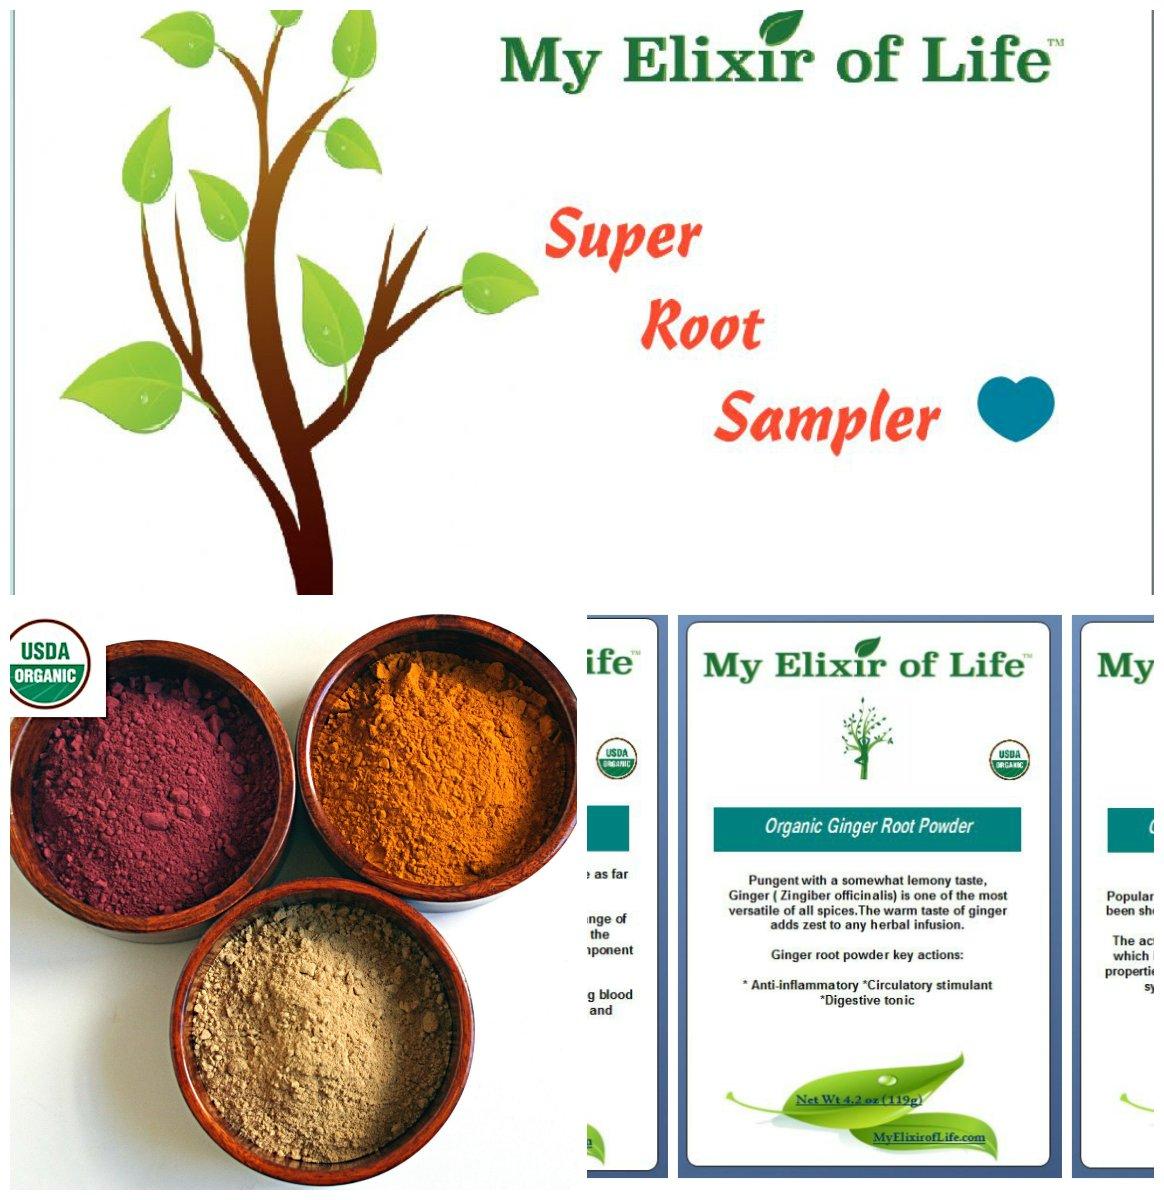 Organic Super Root Sampler-Beet Root, Ginger Root & Turmeric Root Powder by My Elixir of Life